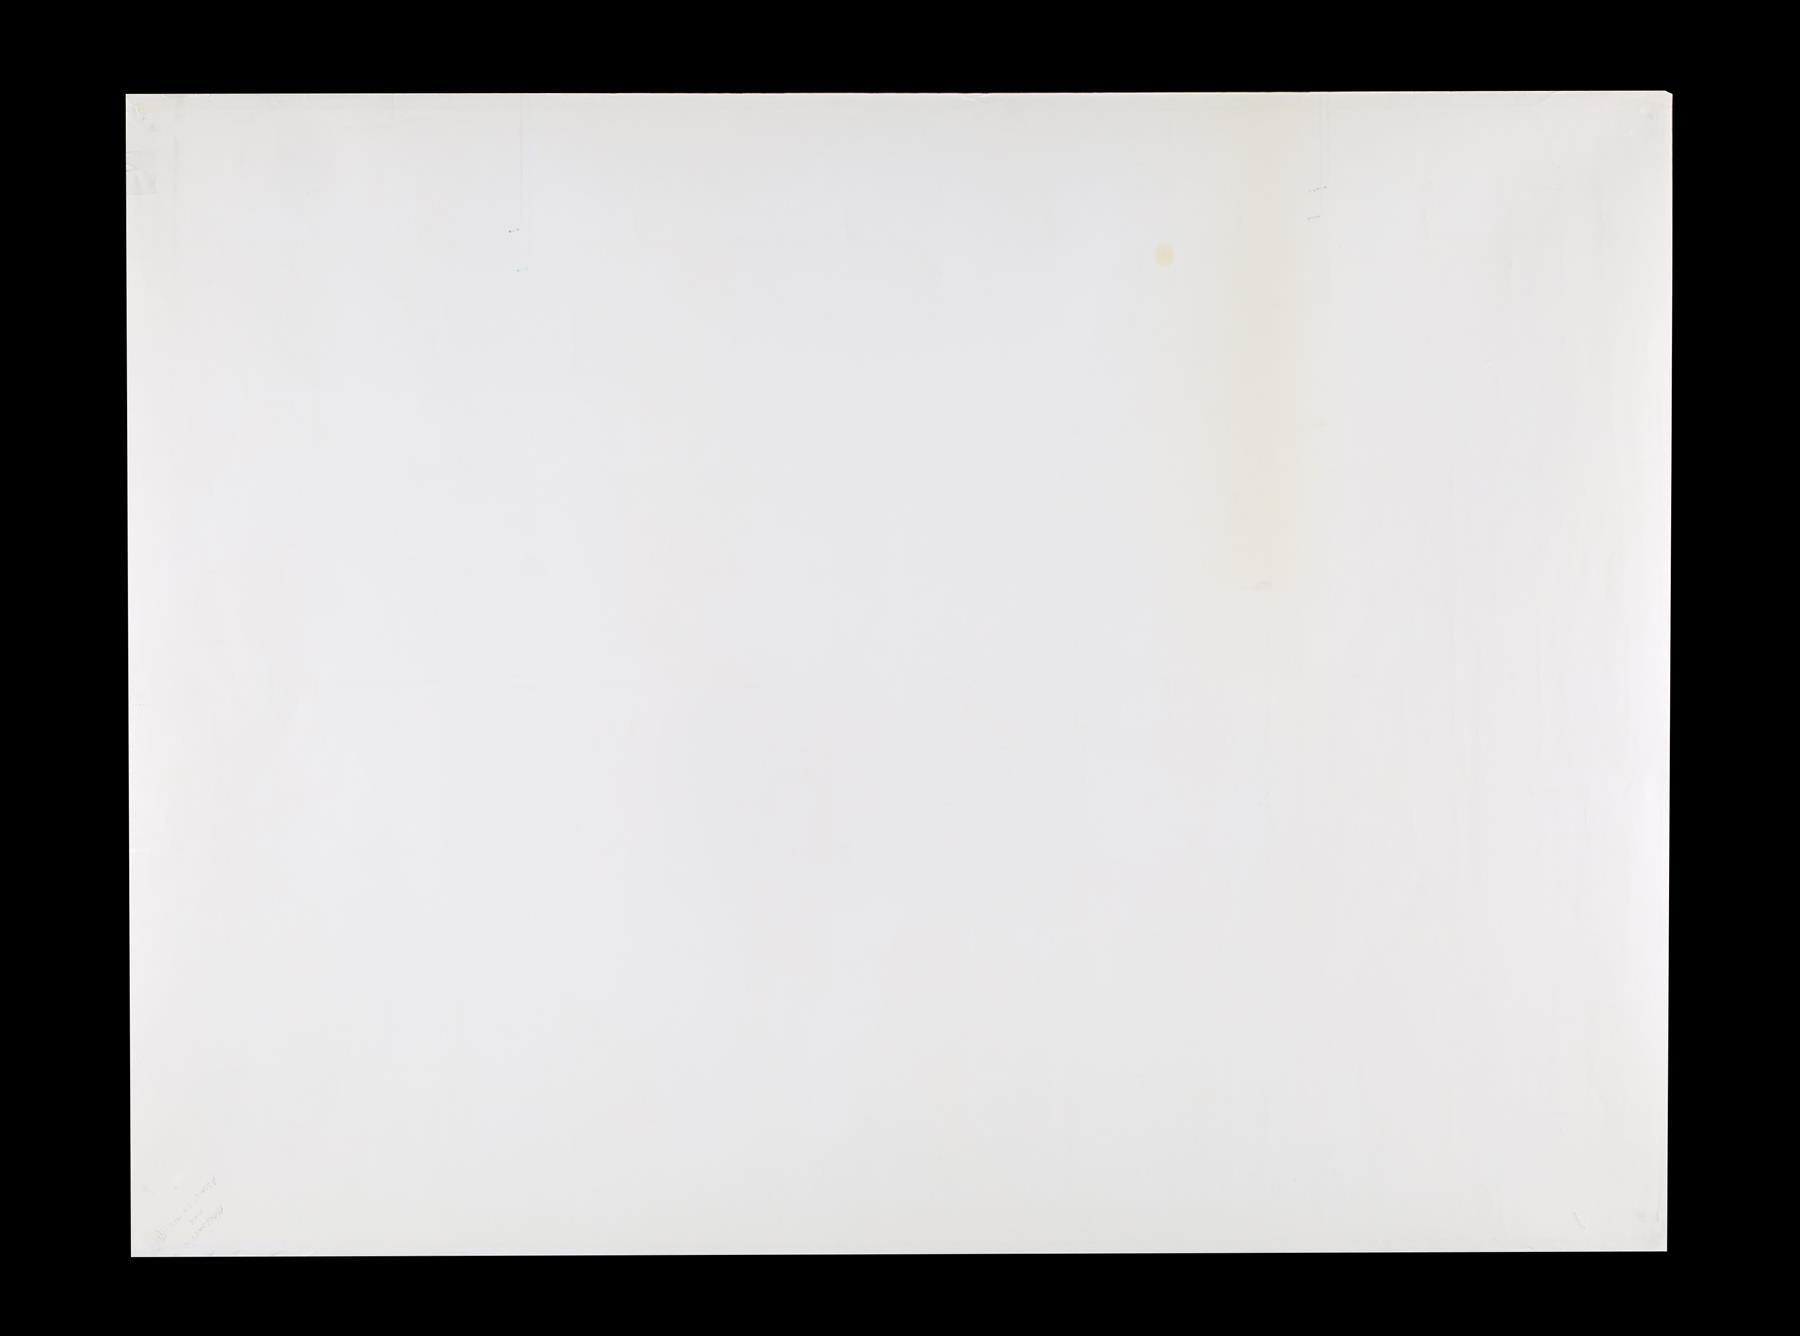 ASSAULT ON PRECINCT 13 (1976), HALLOWEEN (1979) - Two UK Quads, 1979 - Image 5 of 5